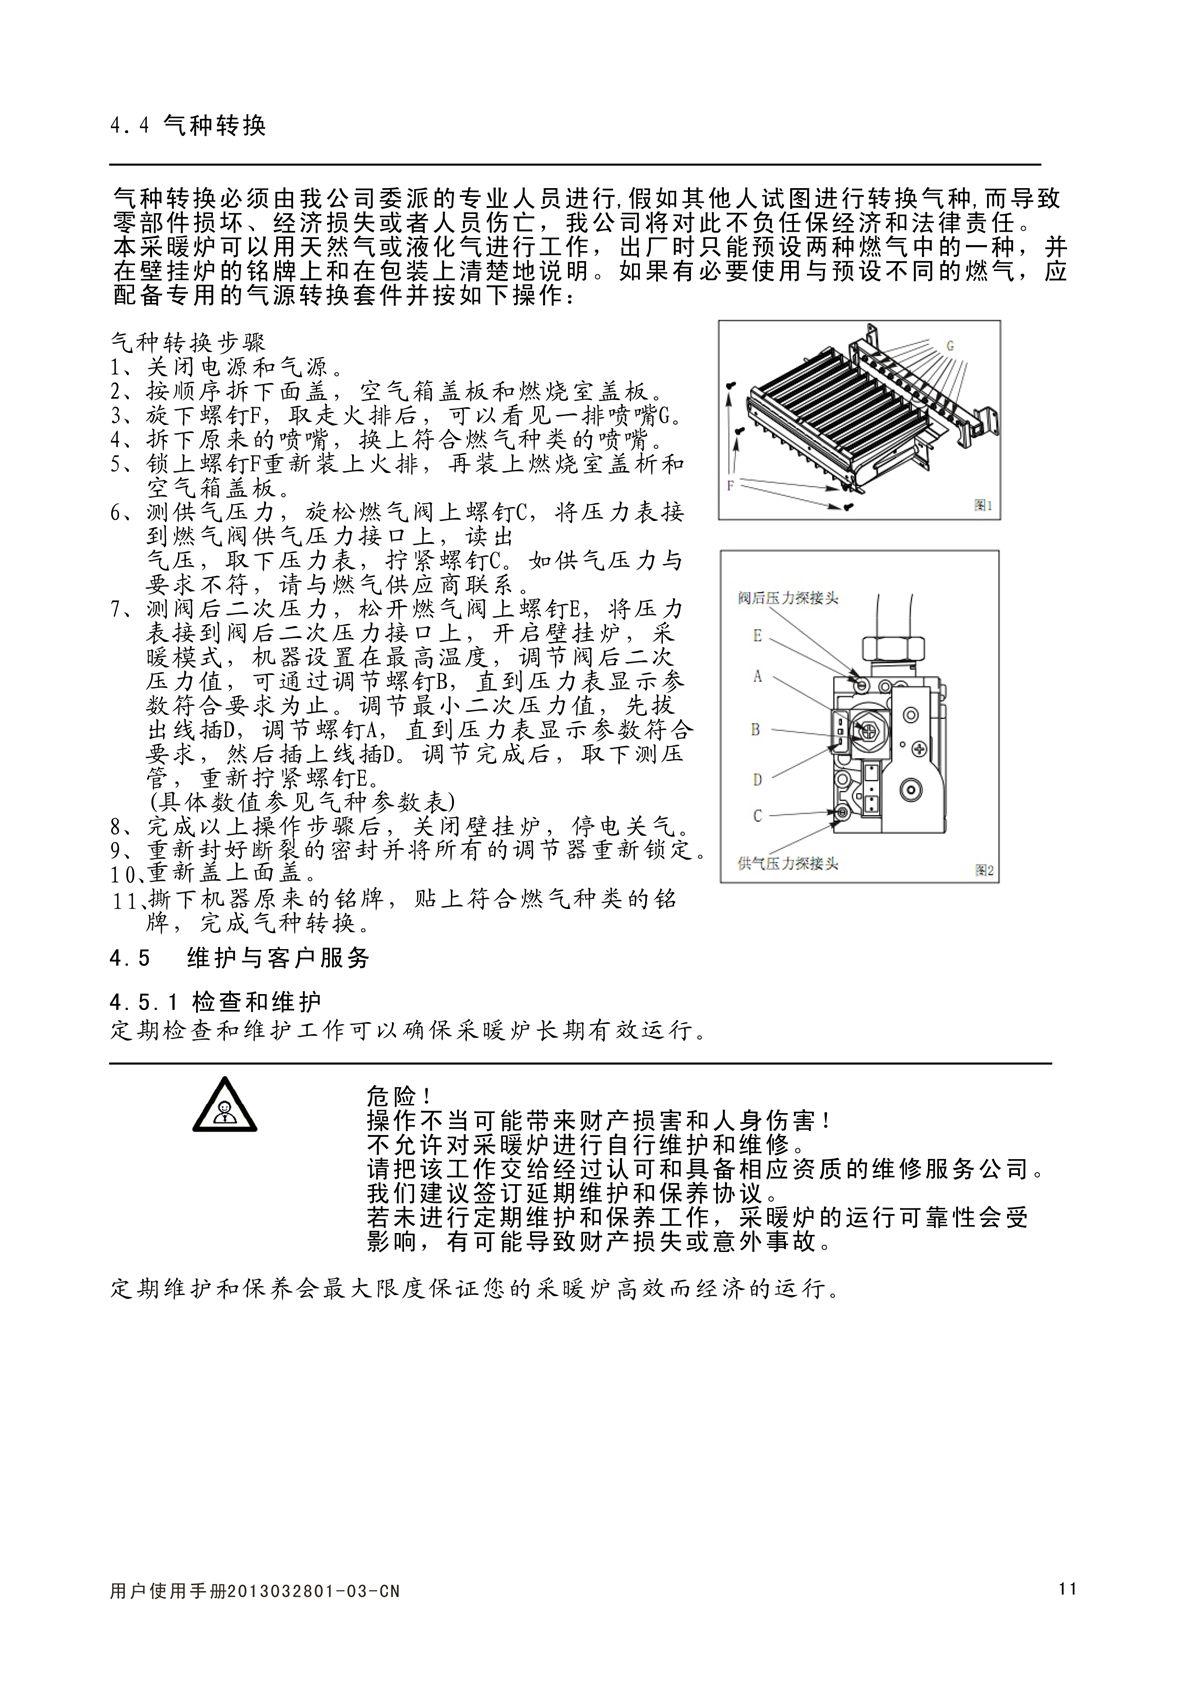 ES16B系列-用户使用手册-7_02.jpg